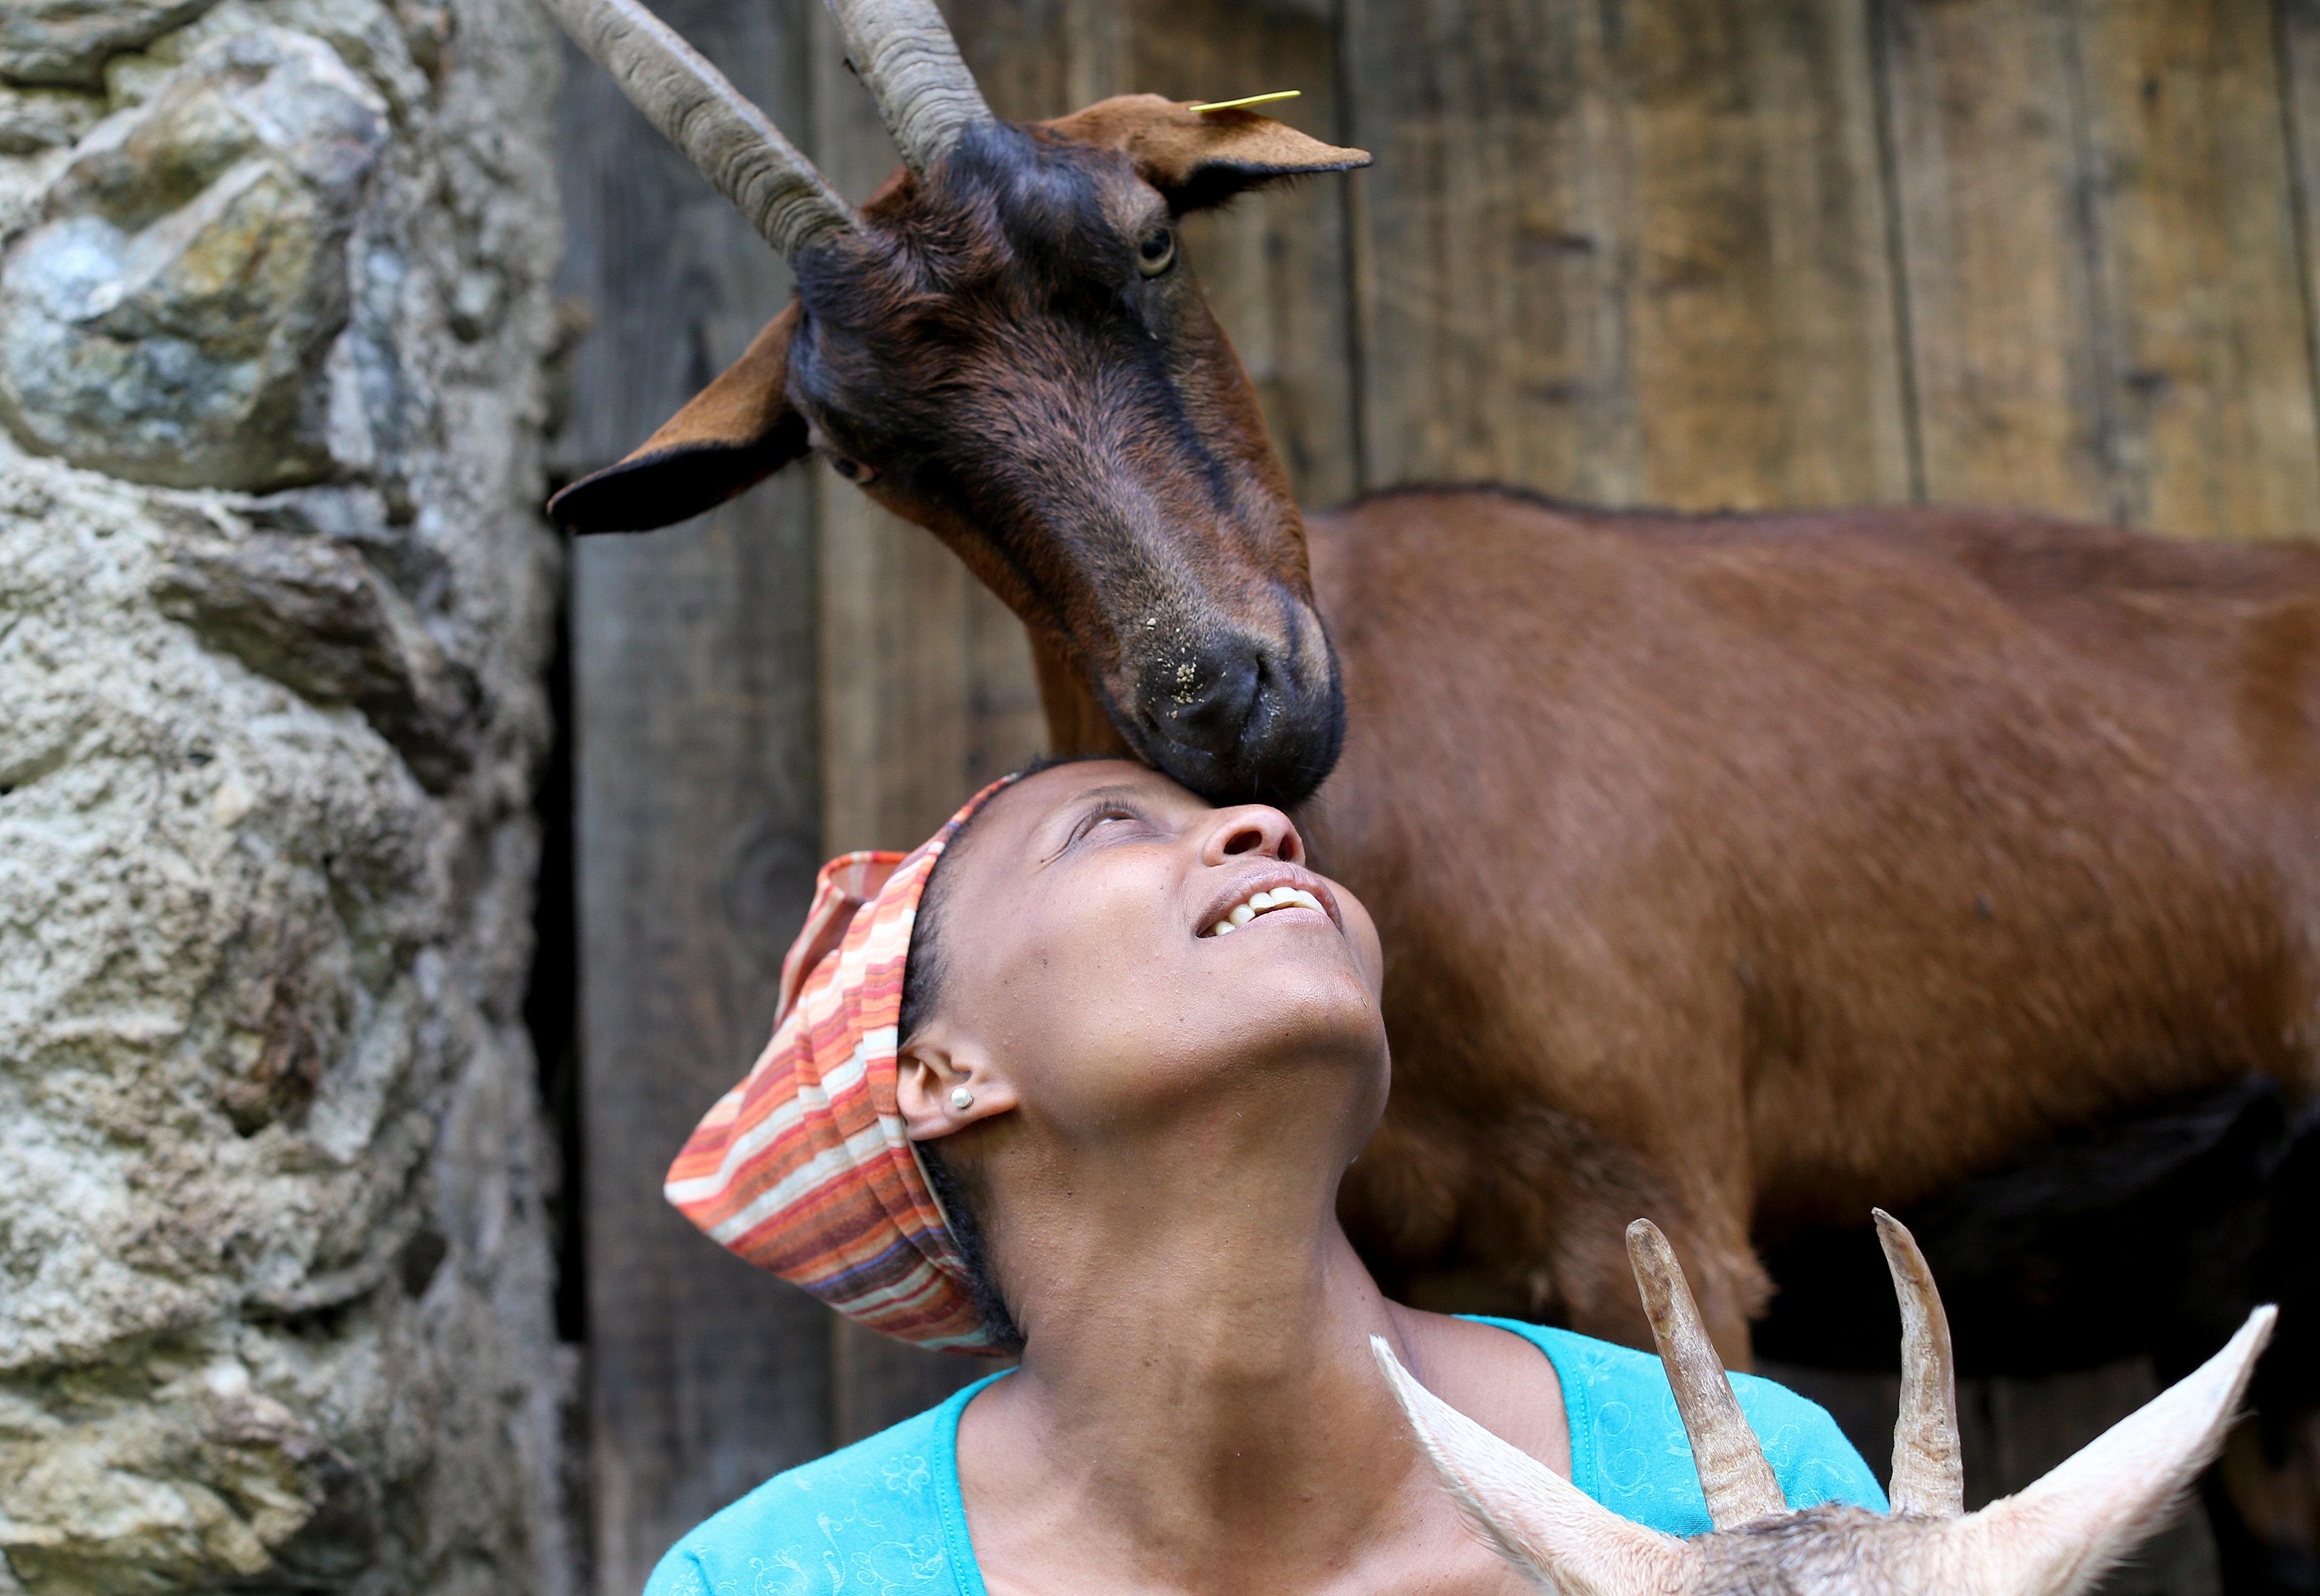 A Mochena goat nuzzles up to Ethiopian Agitu Idea Gudeta, 40, at the her stable at the Valle dei Mocheni near Trento